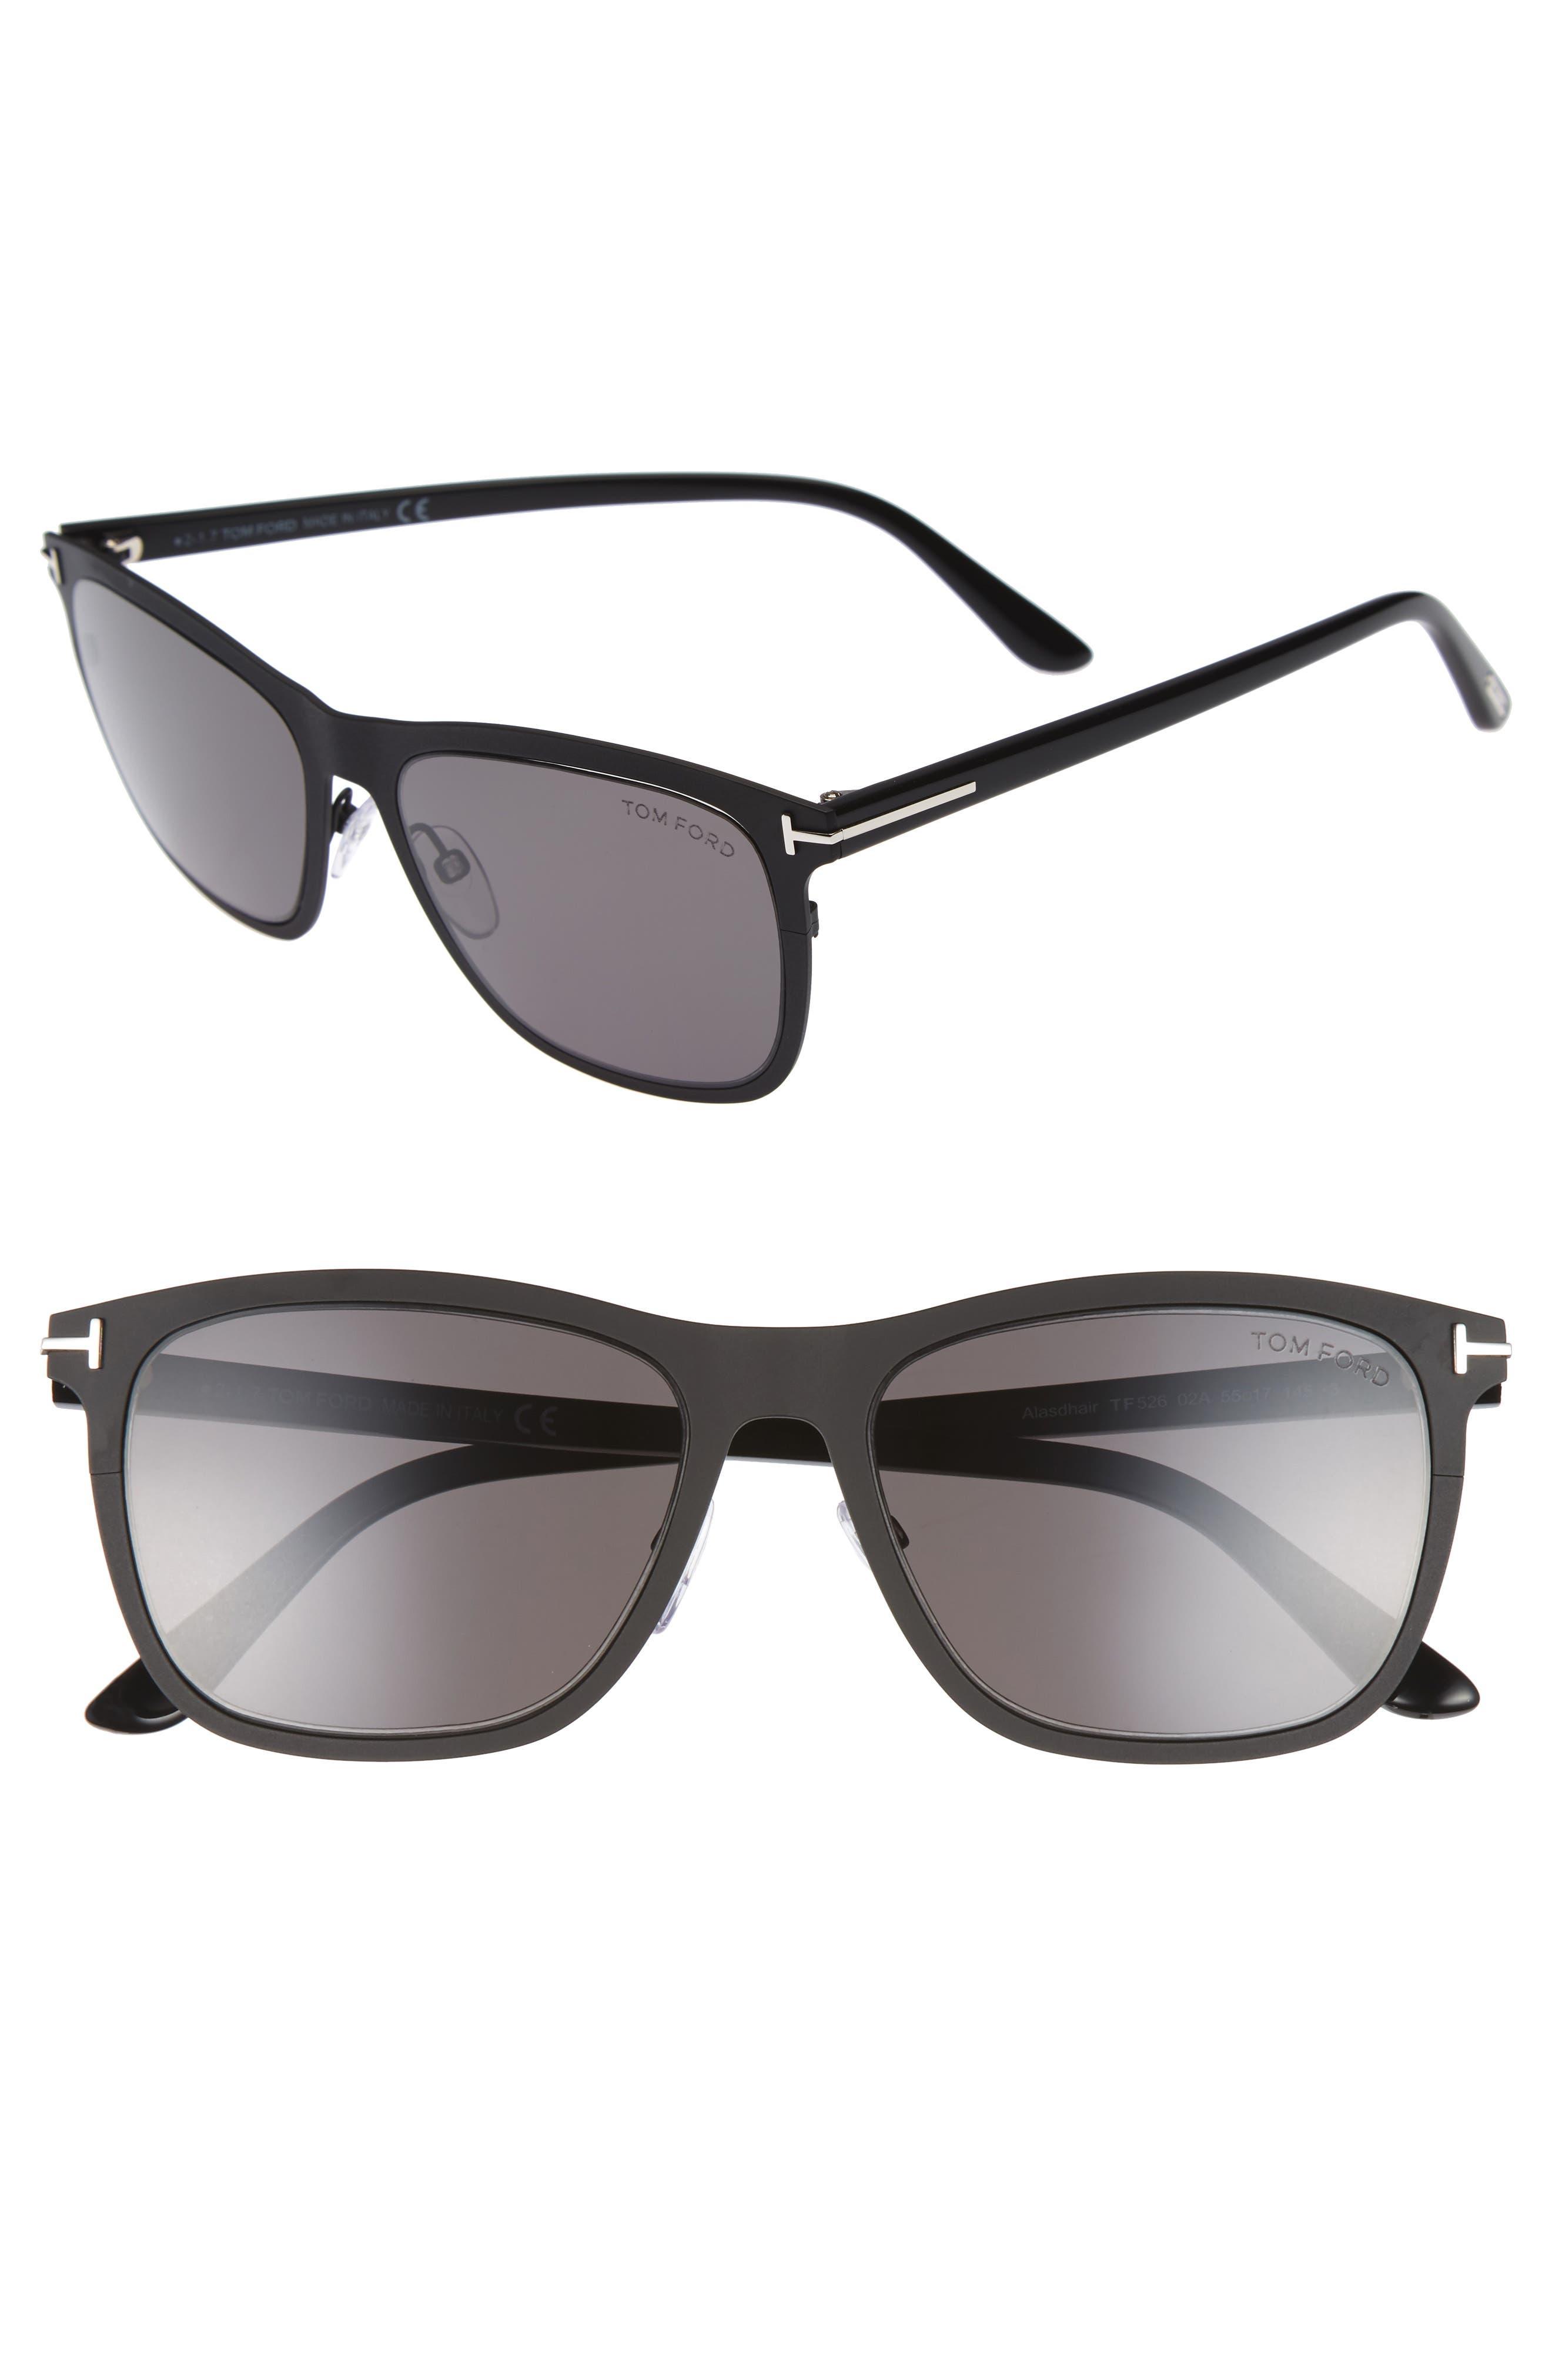 Main Image - Tom Ford Alasdhair 55mm Sunglasses